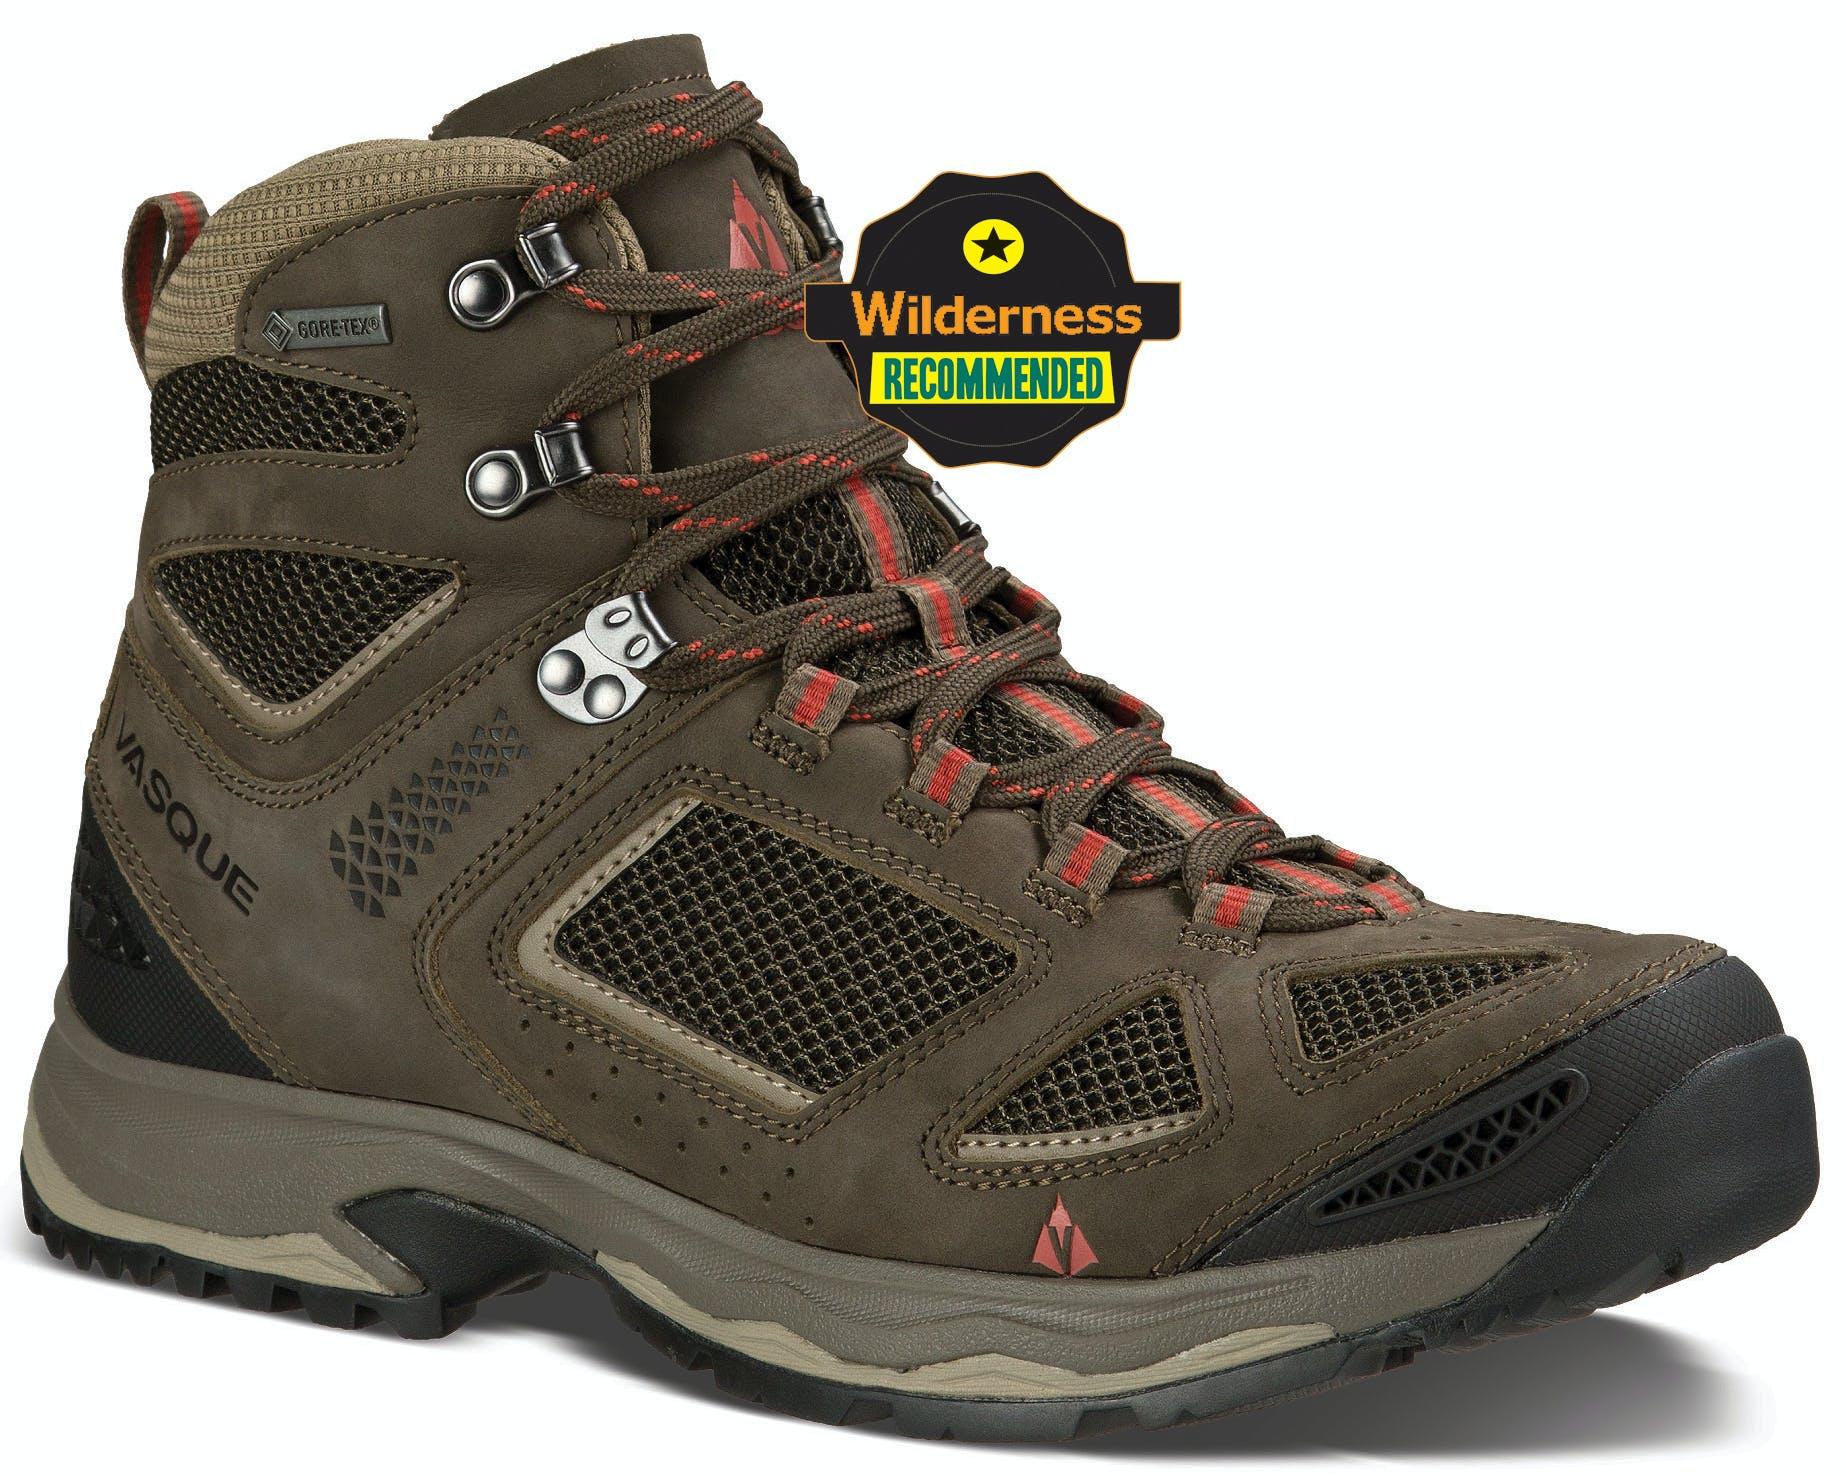 82e1f3c5eef Vasque Breeze III GTX Review - Outdoor Gear - Wilderness Magazine NZ